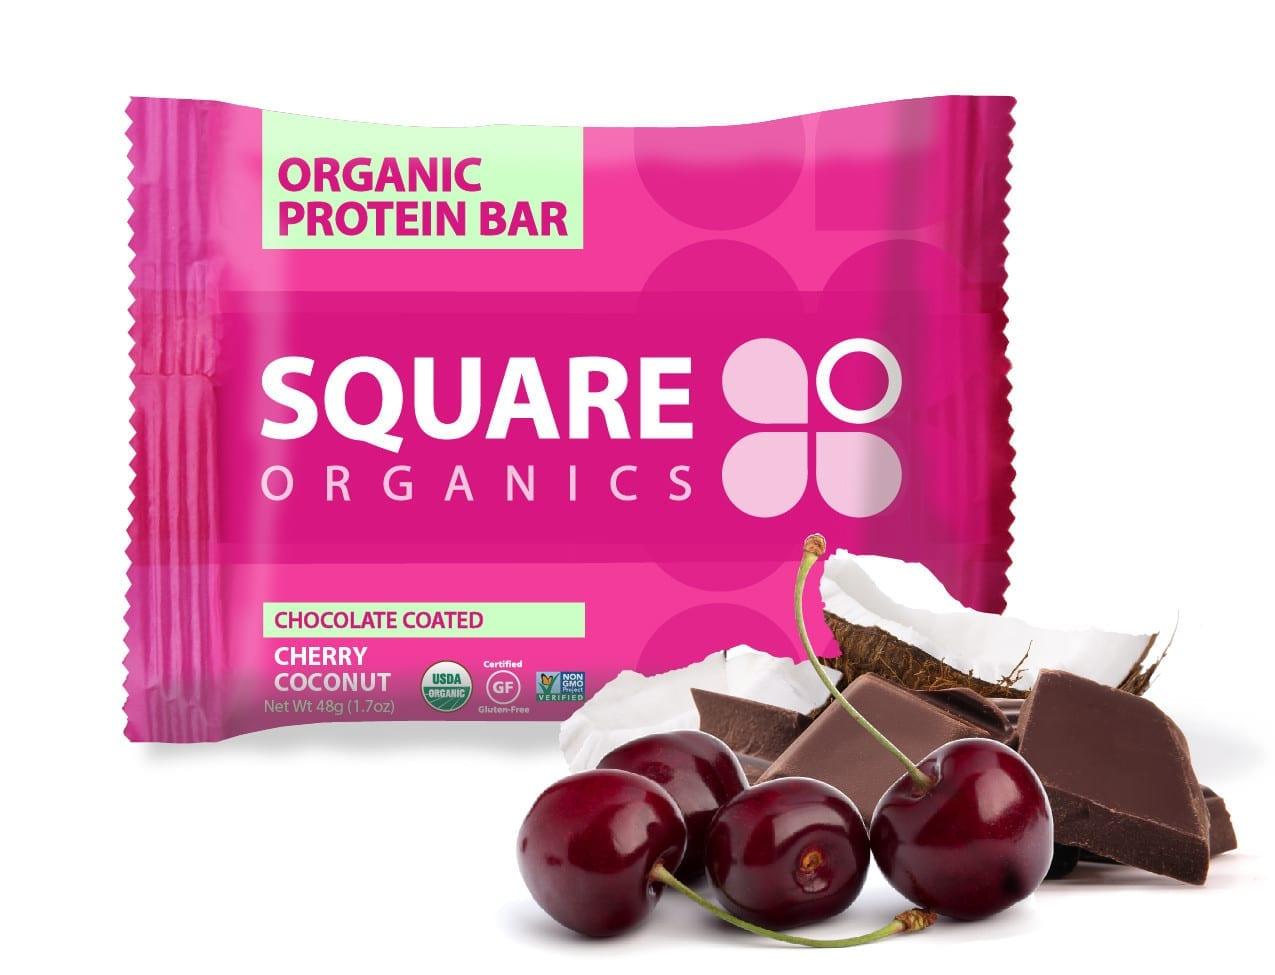 Square Organics Protein Bar